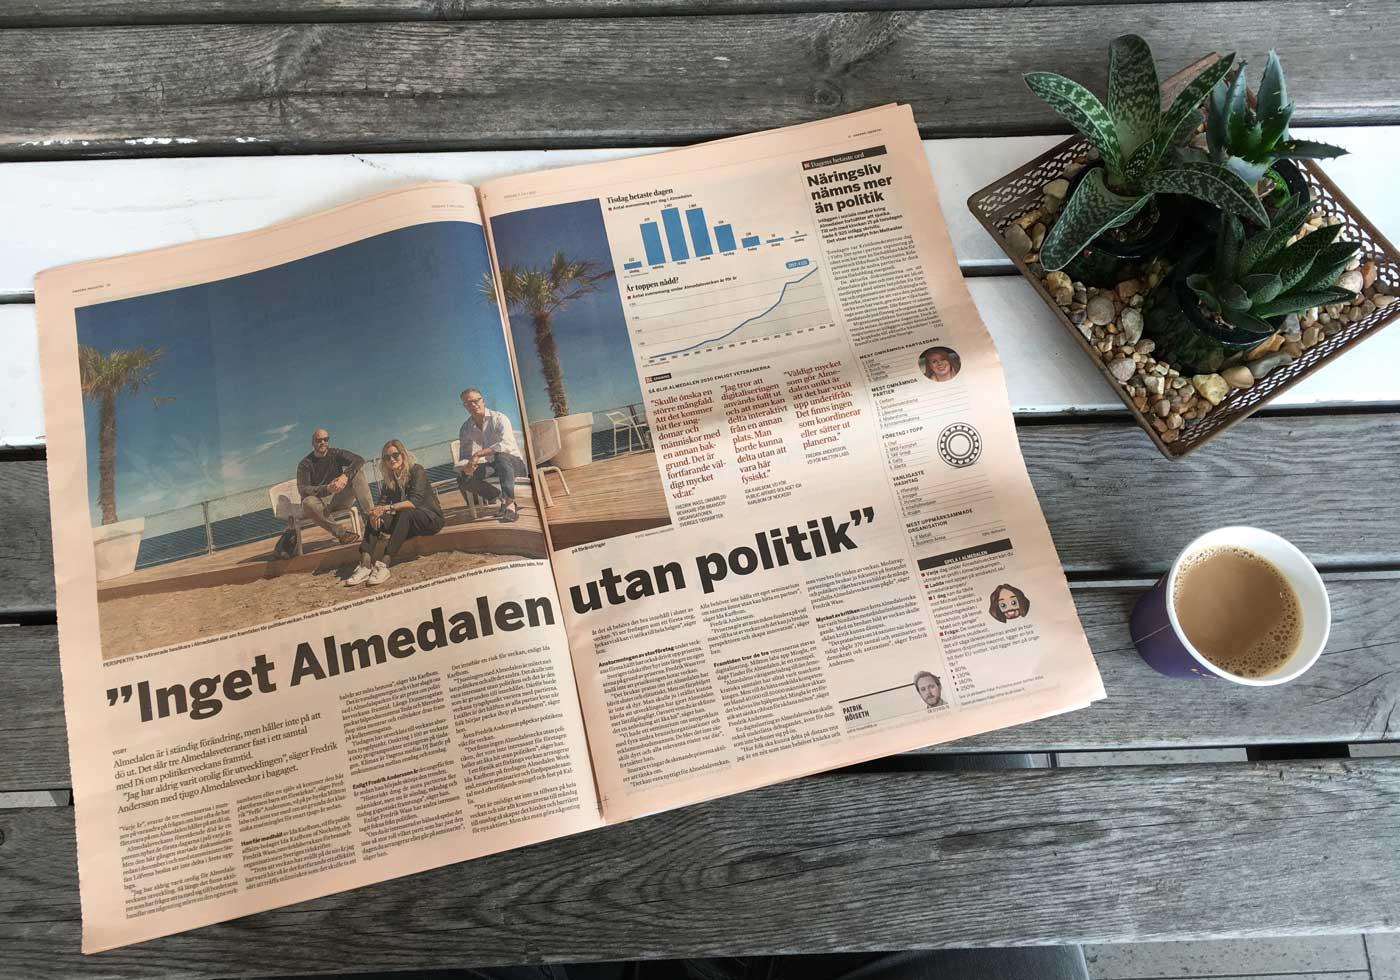 Fredrik Wass, Ida Karlbom och Fredrik Andersson i Dagens Industri 6 juli 2017